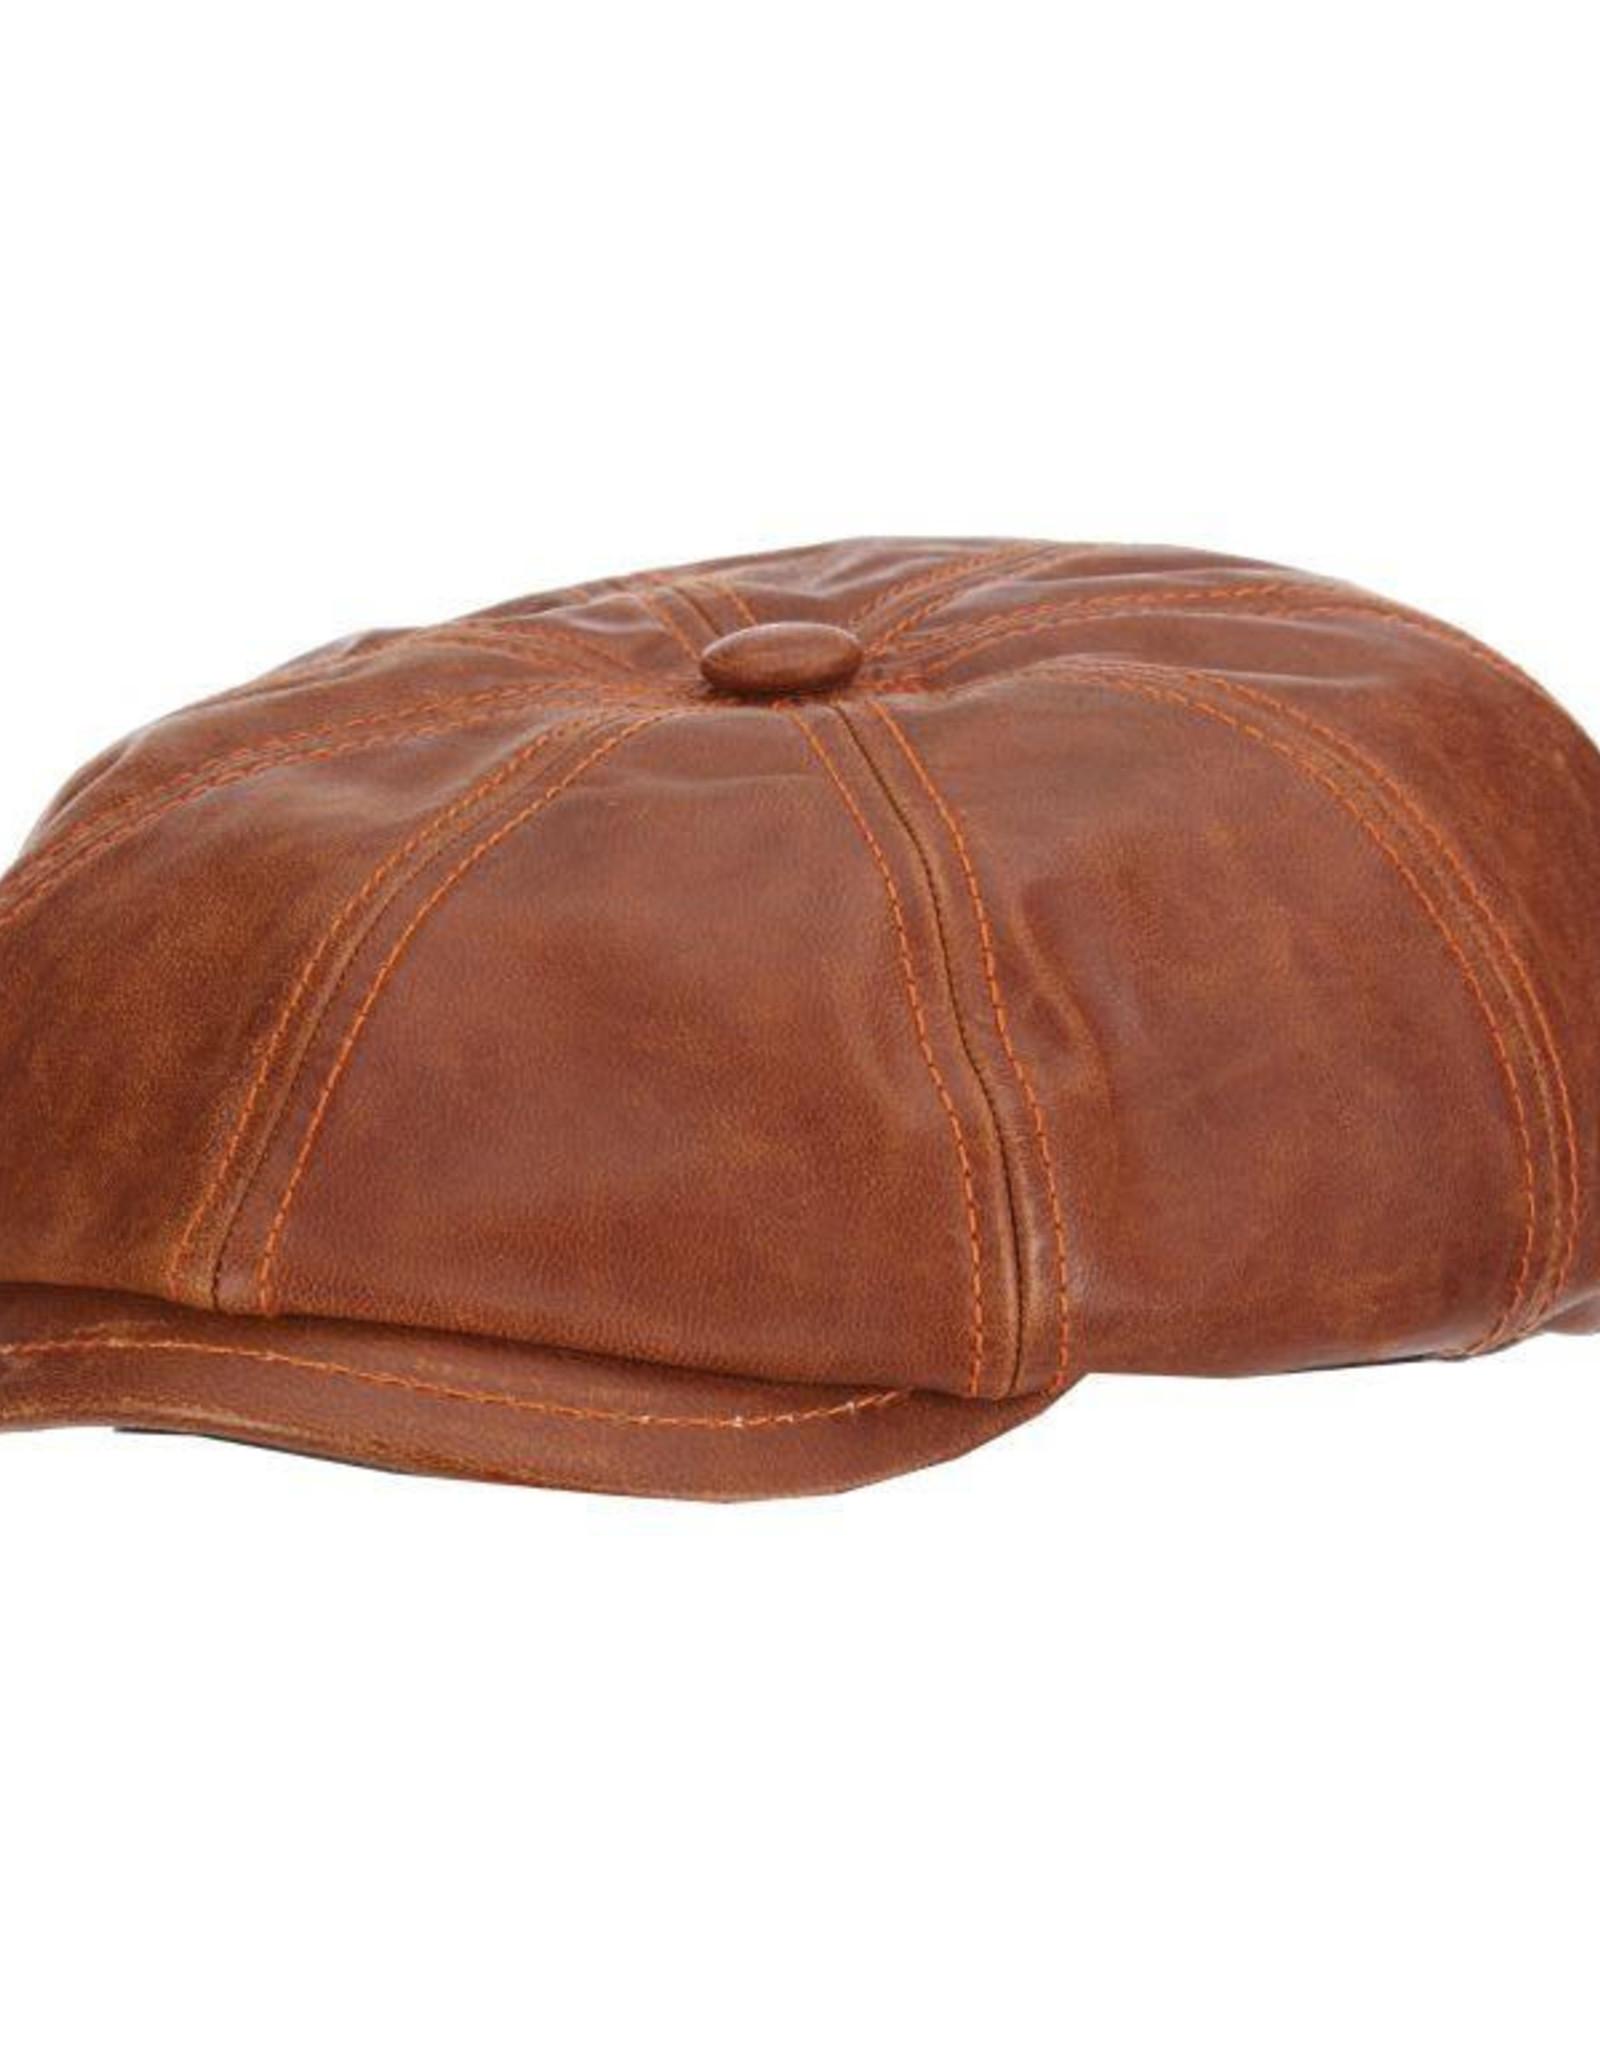 STETSON Hat Stetson  HARPER Goat Leather Saddle